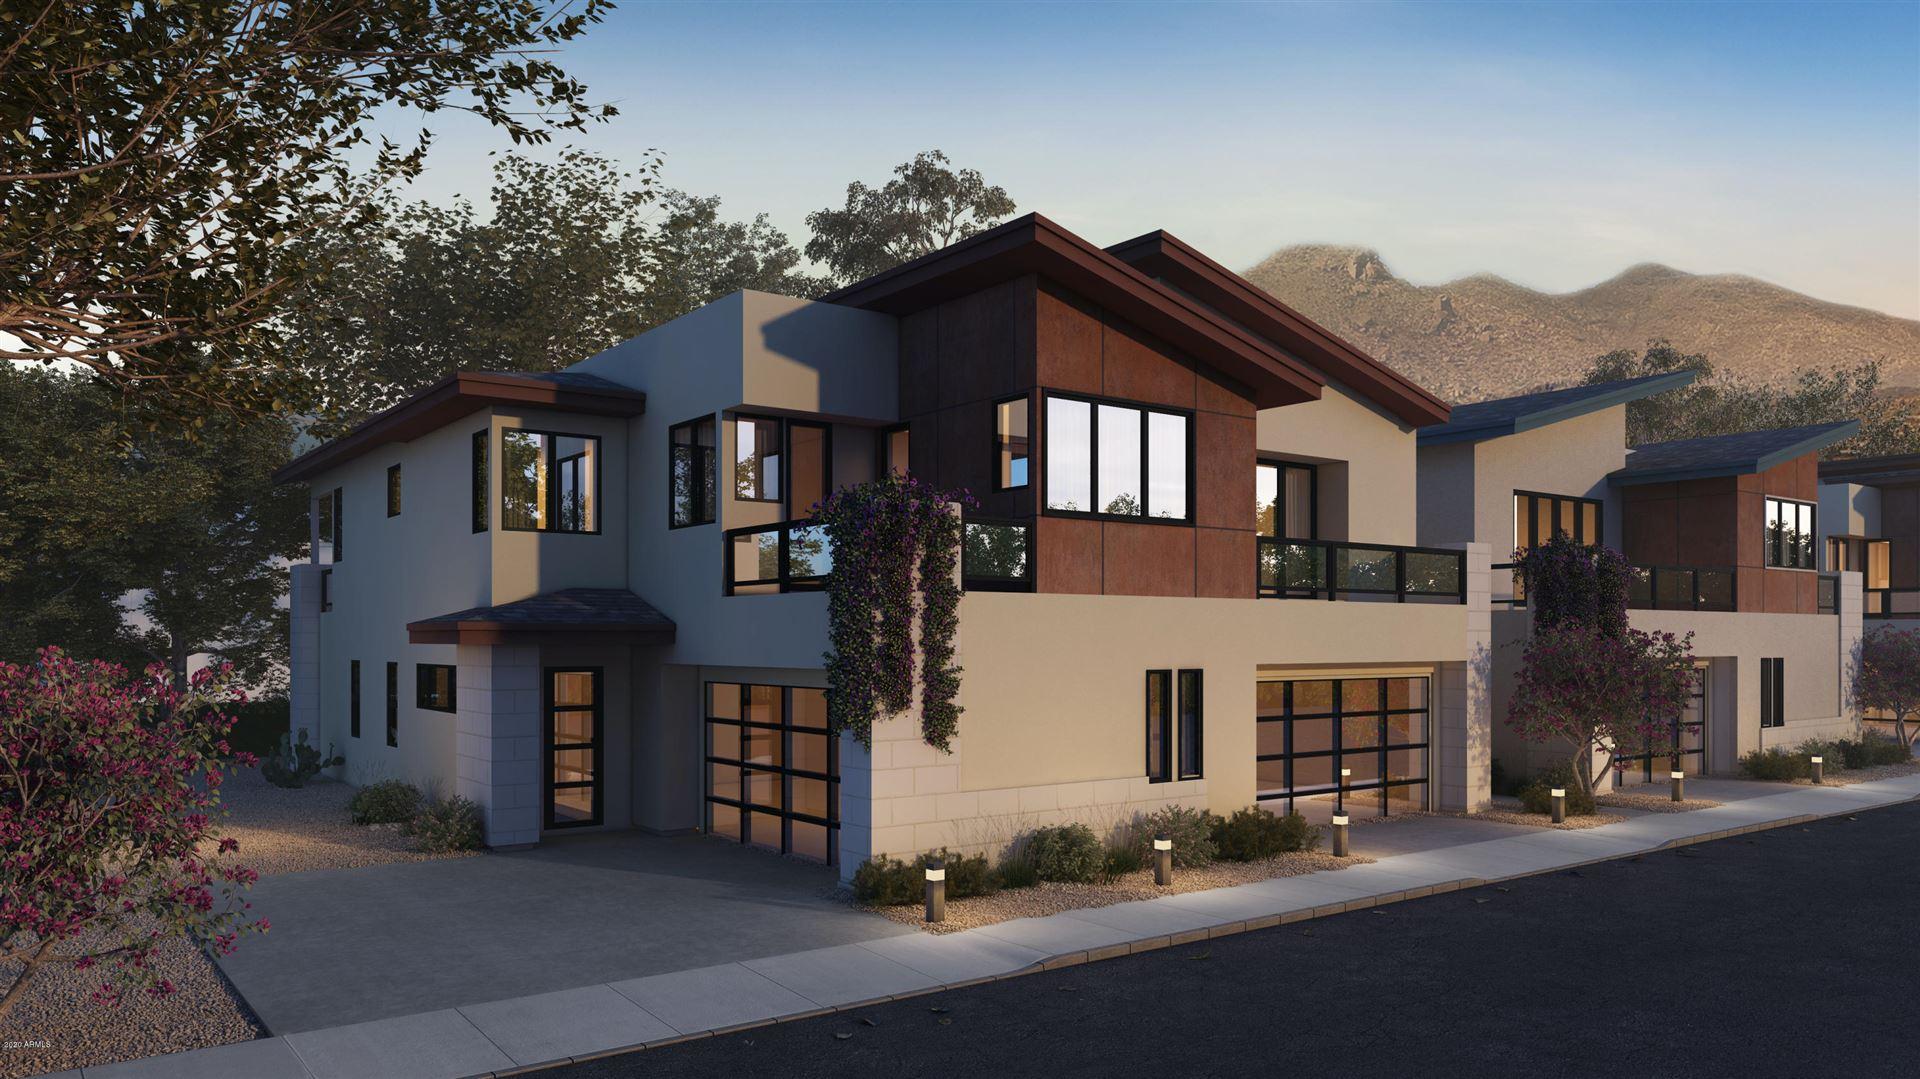 Photo of One E Easy Street #2, Carefree, AZ 85377 (MLS # 6191229)